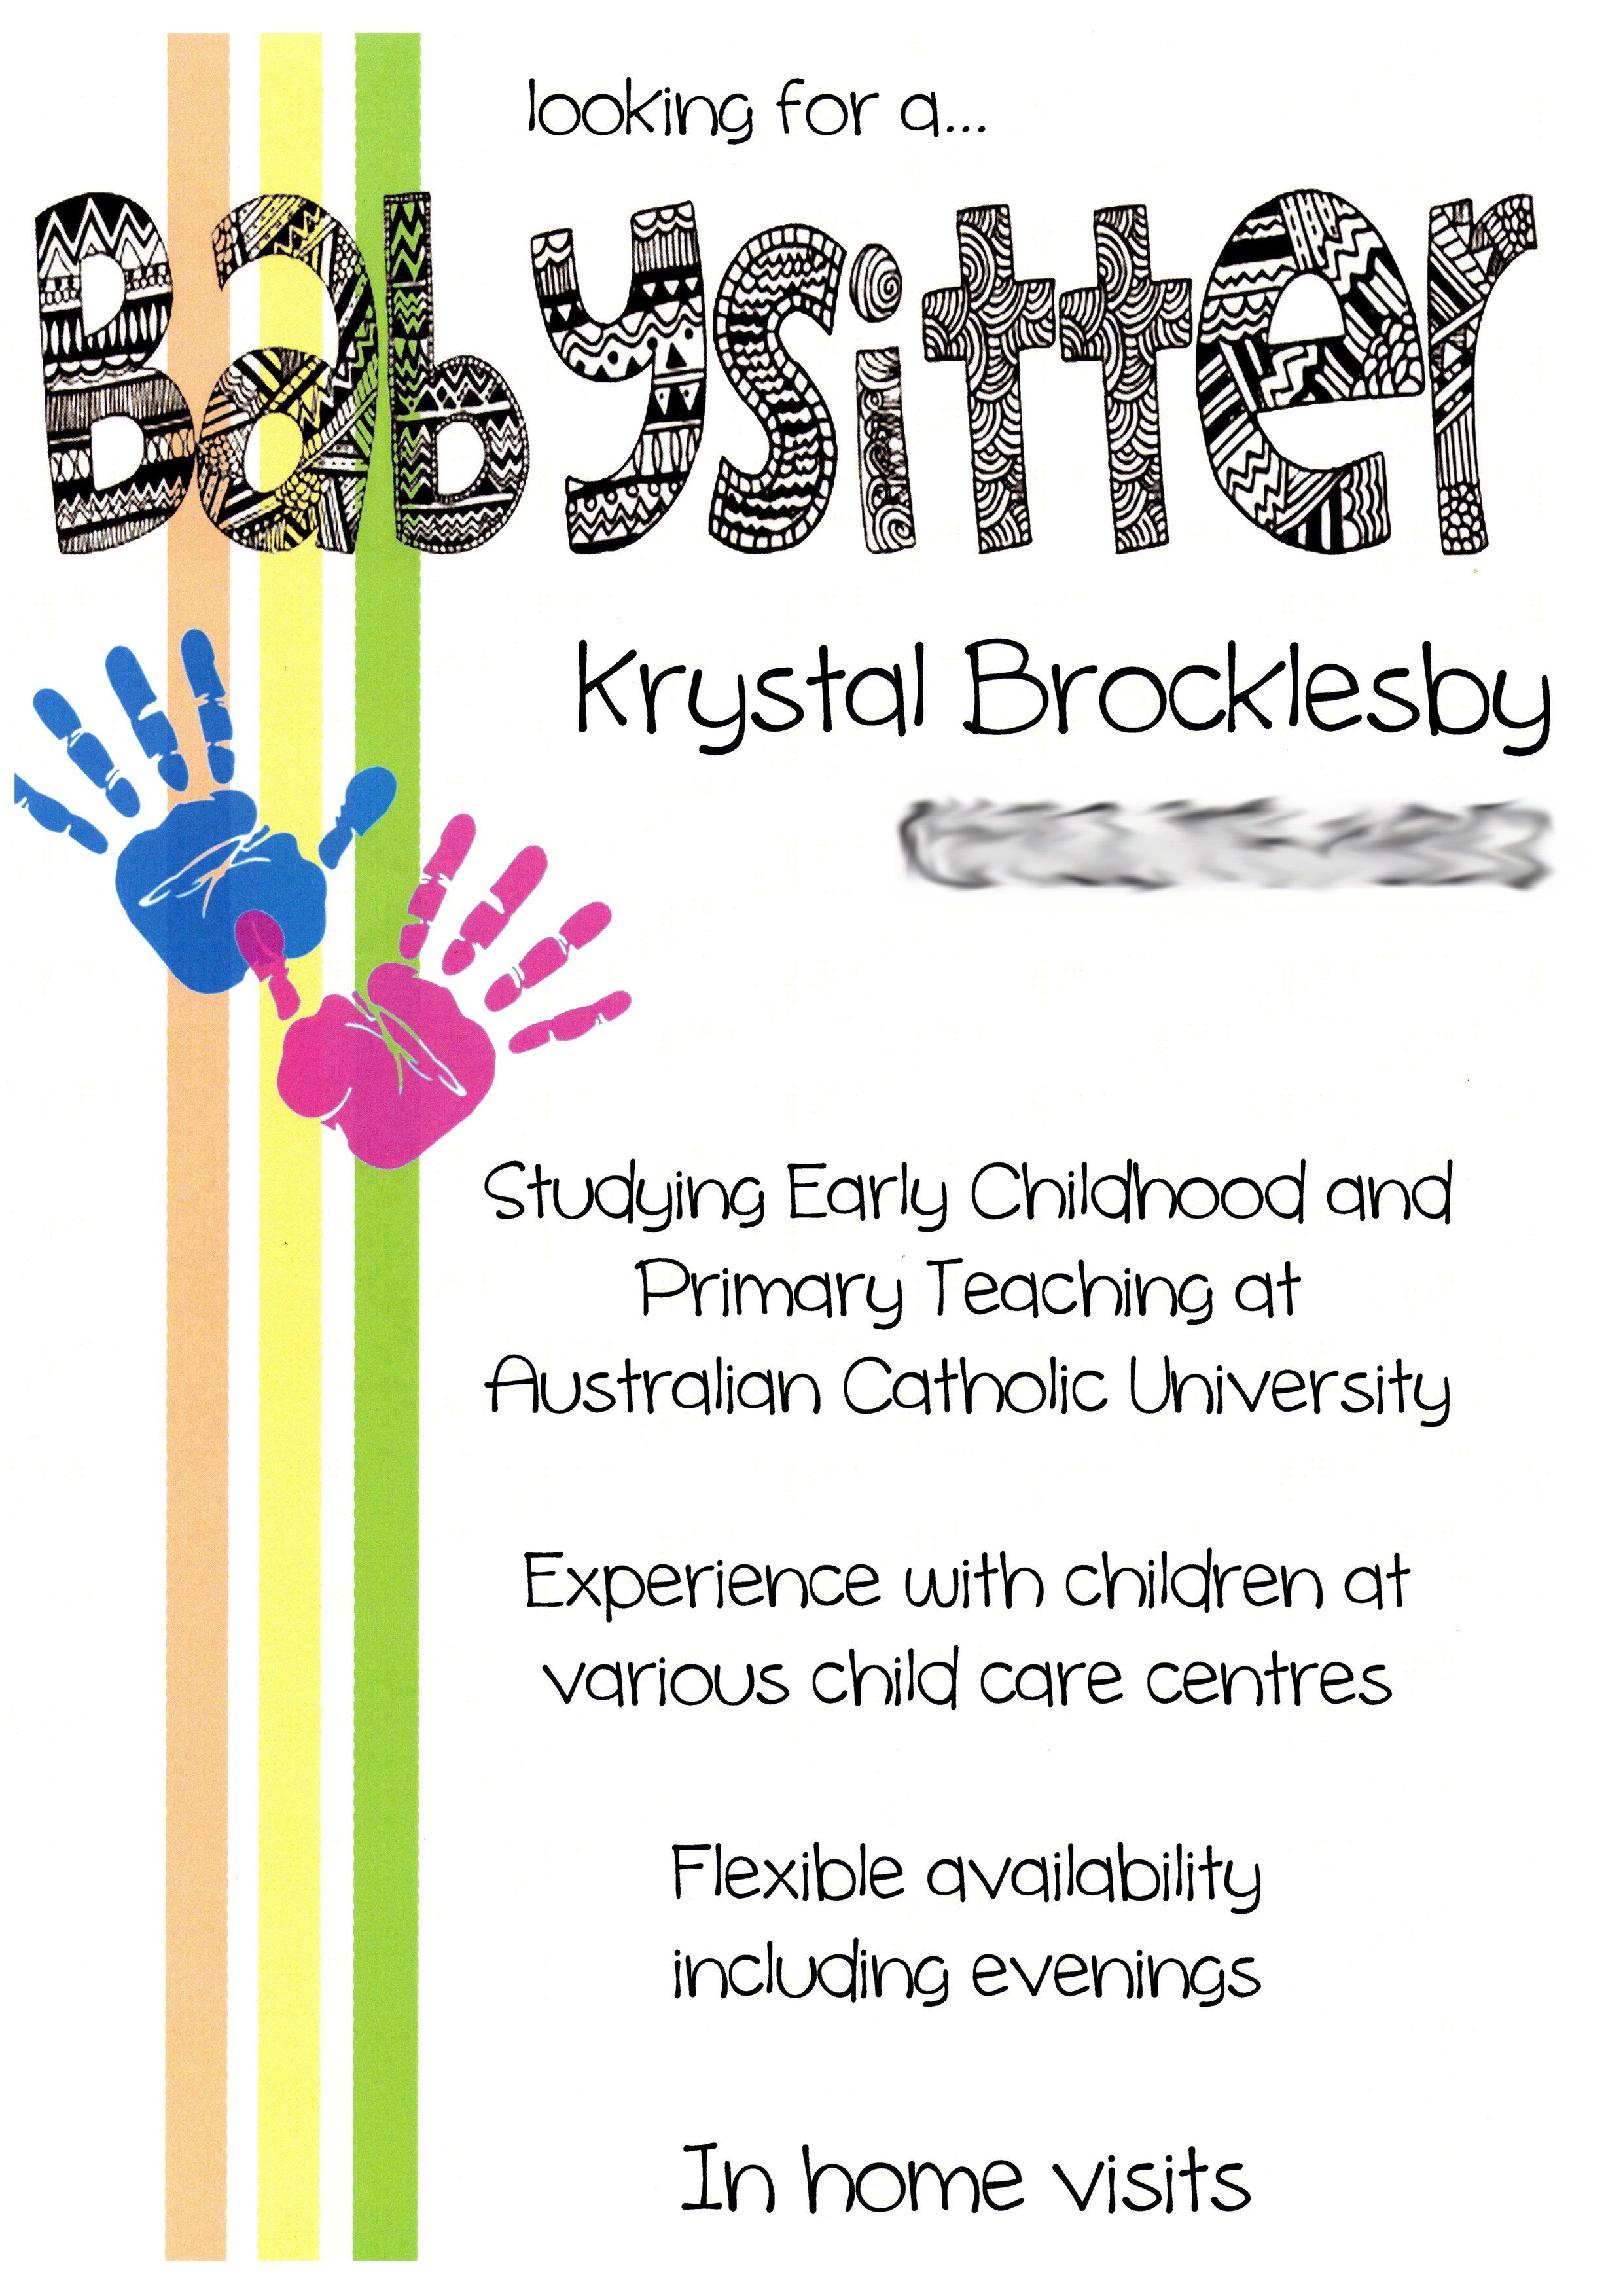 Creative, Cute Babysitting Flyers | Babysitting Flyers | Babysitting - Free Printable Home Daycare Flyers